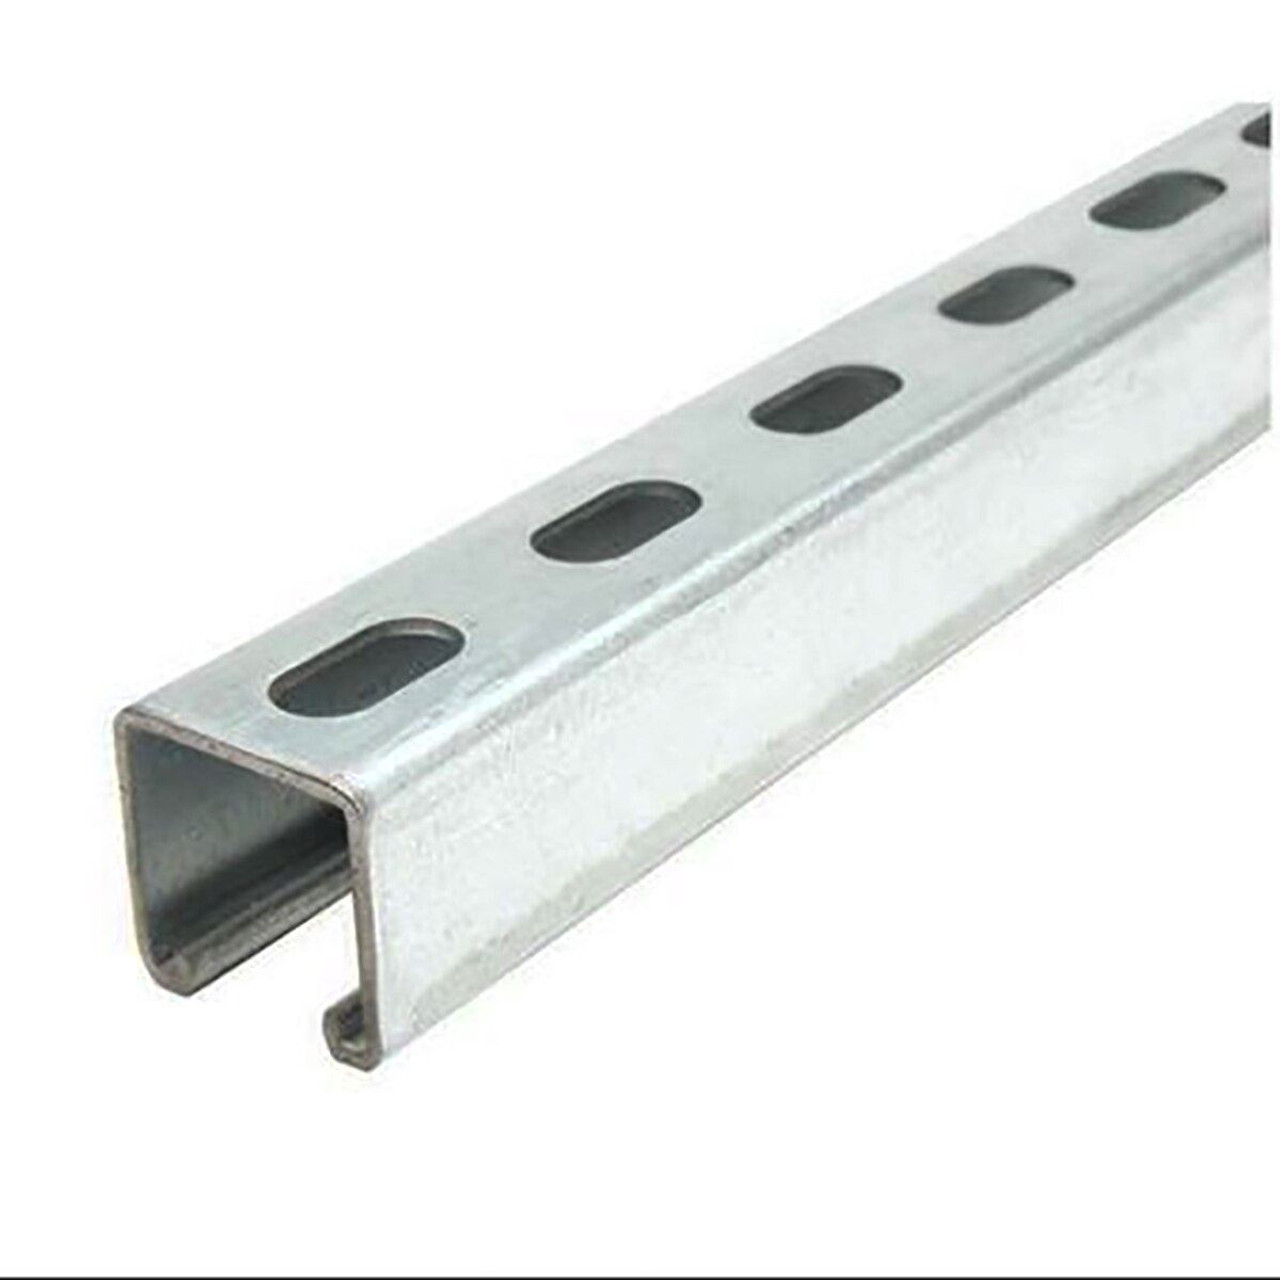 "Galvanized Steel, Half Slotted Strut Channel, 1-3/8"" x 1-5/8"", 36 inches, 12 ga."